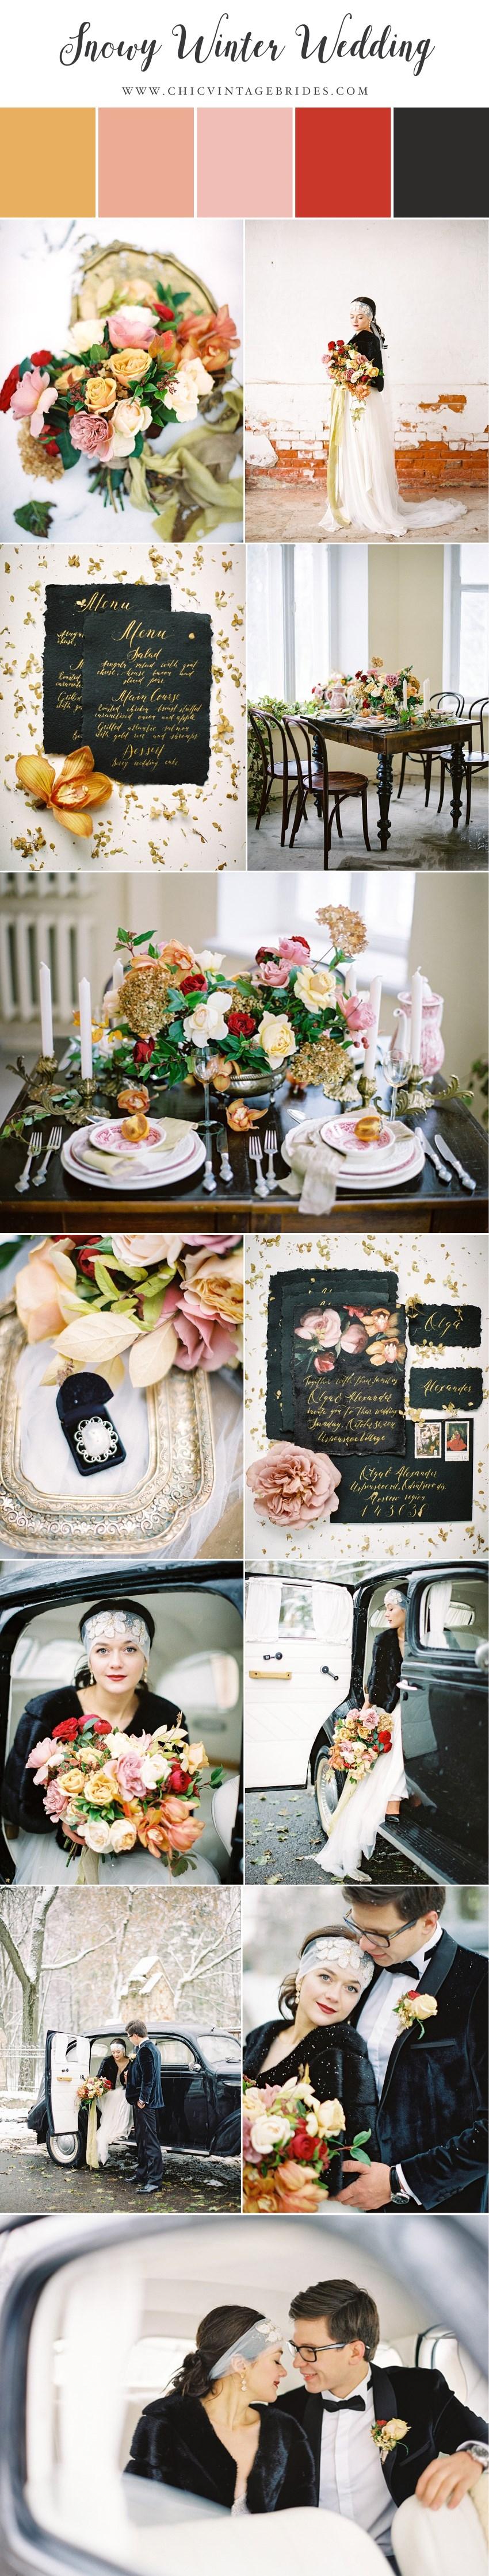 Aristocratic Snowy Winter Wedding in Russia